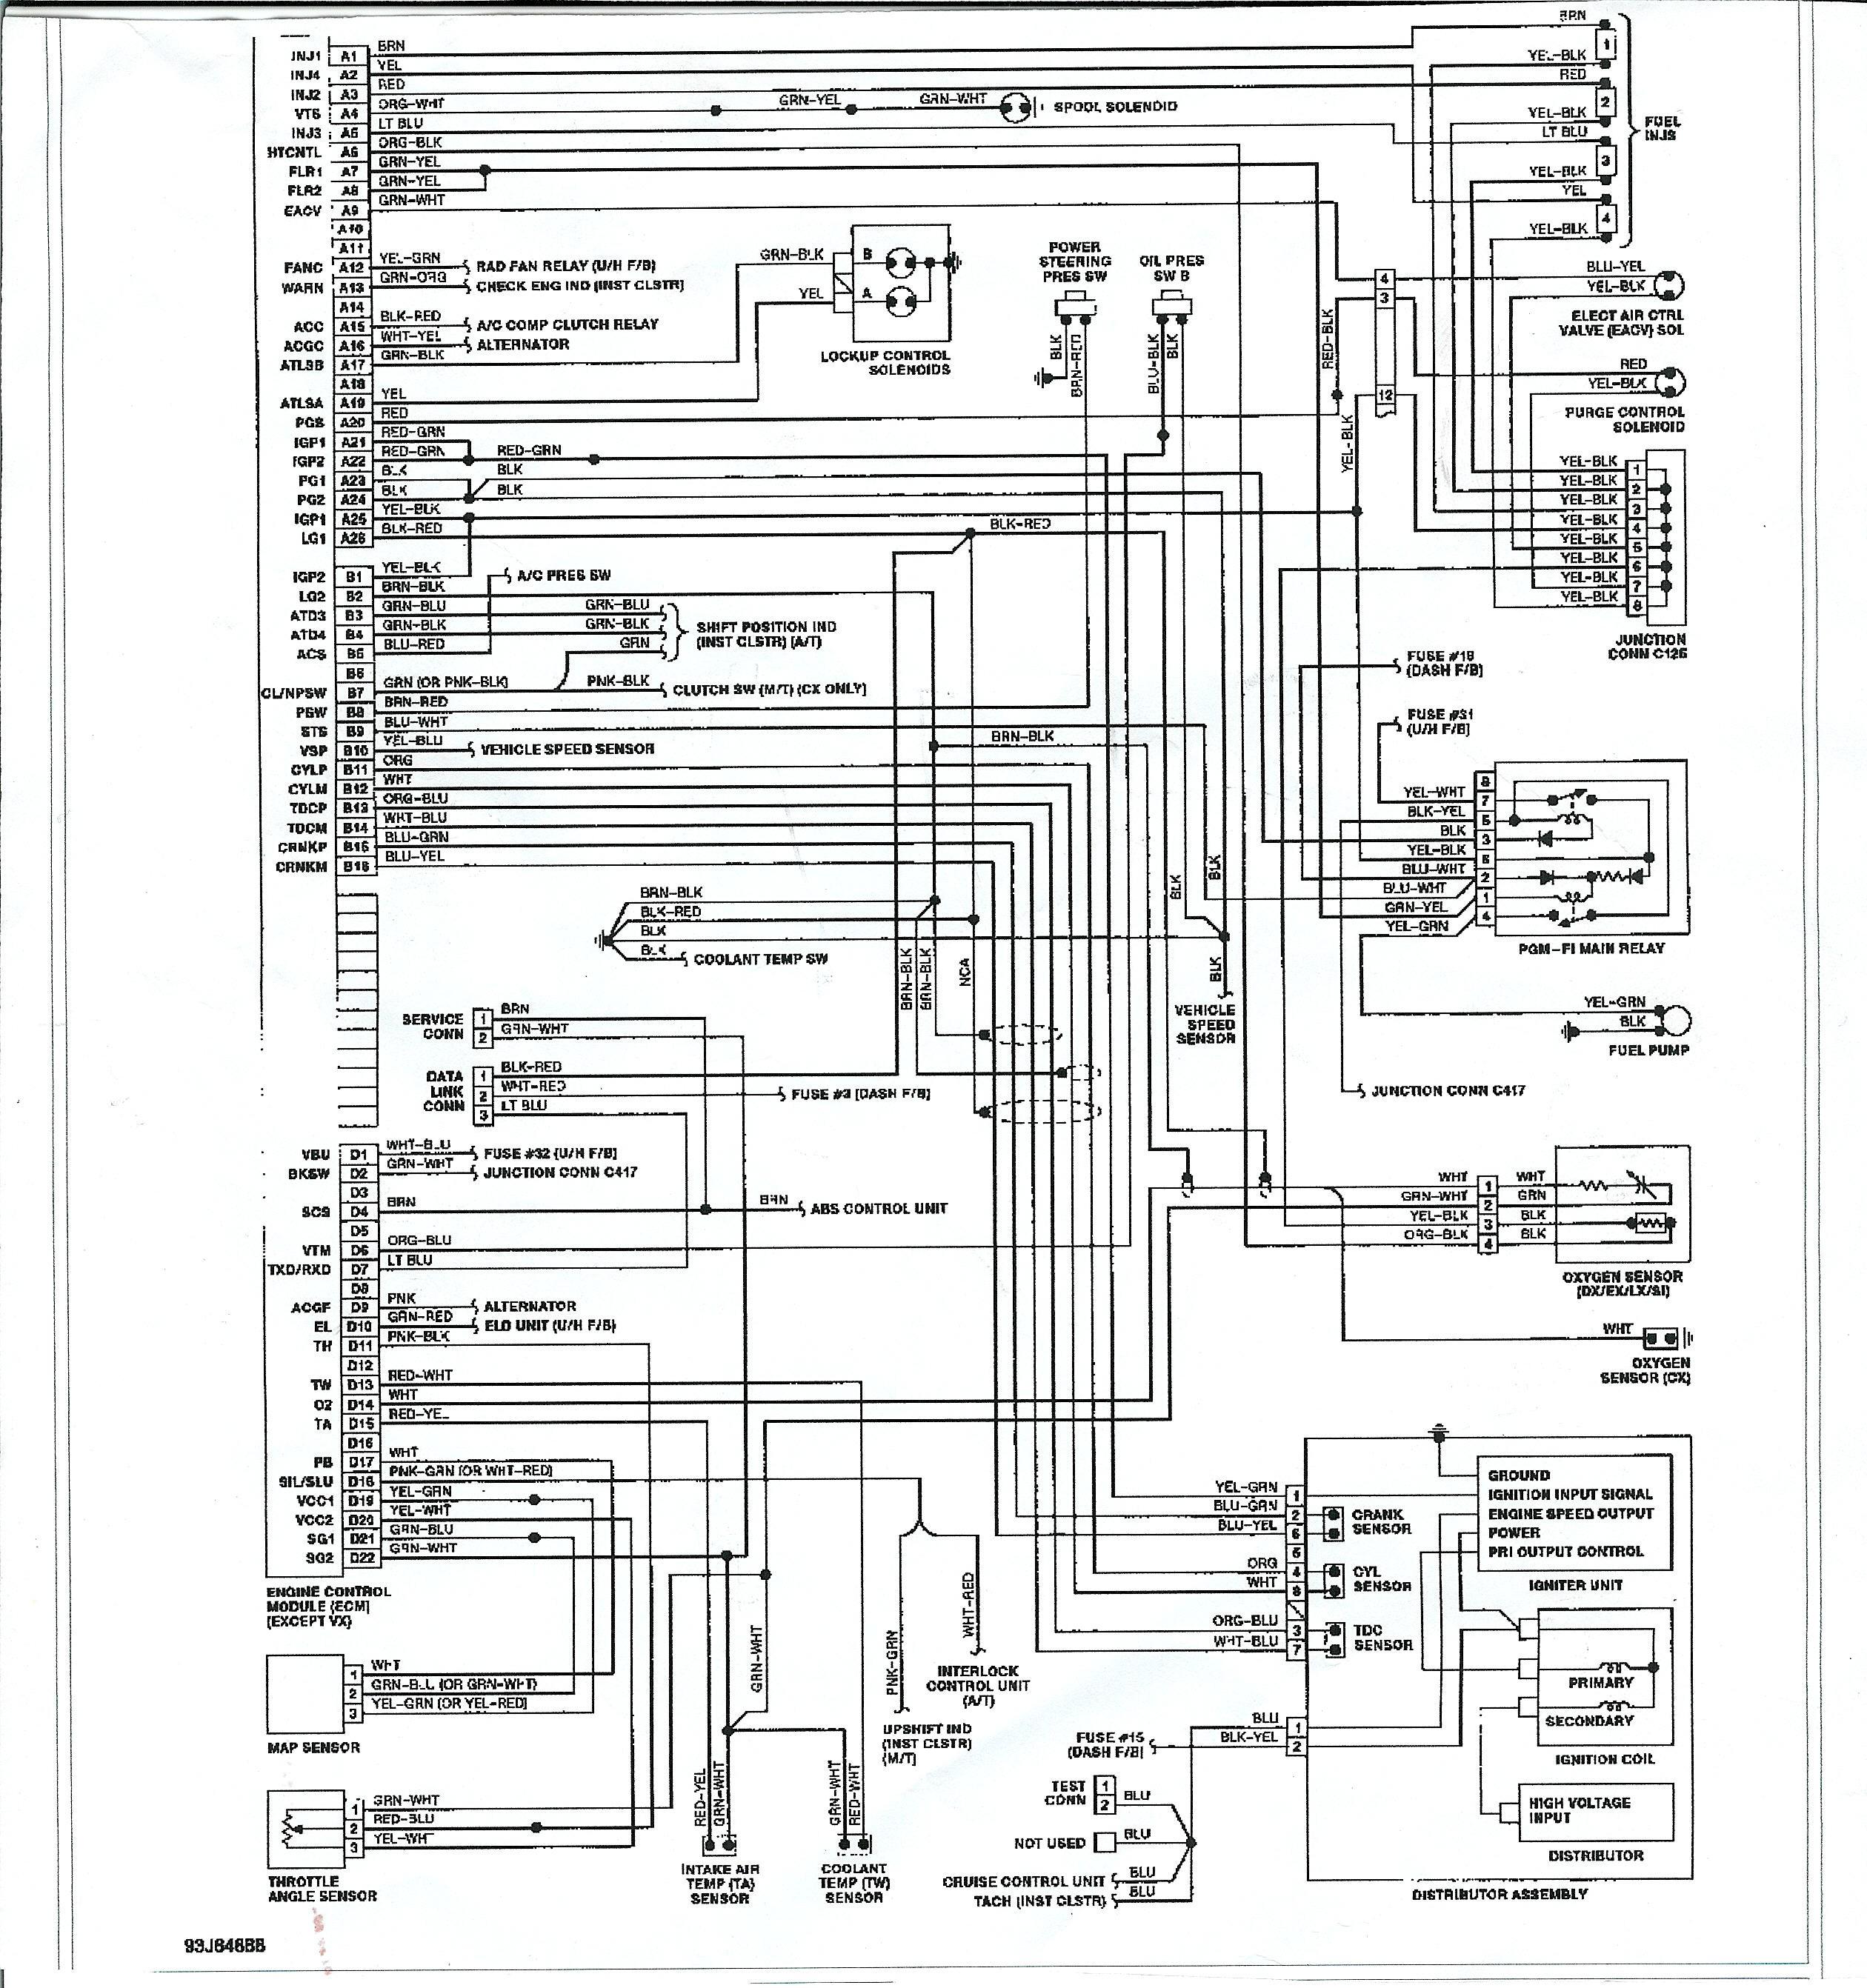 2012 honda accord wiring diagram ford steering box xr650l imageresizertool com